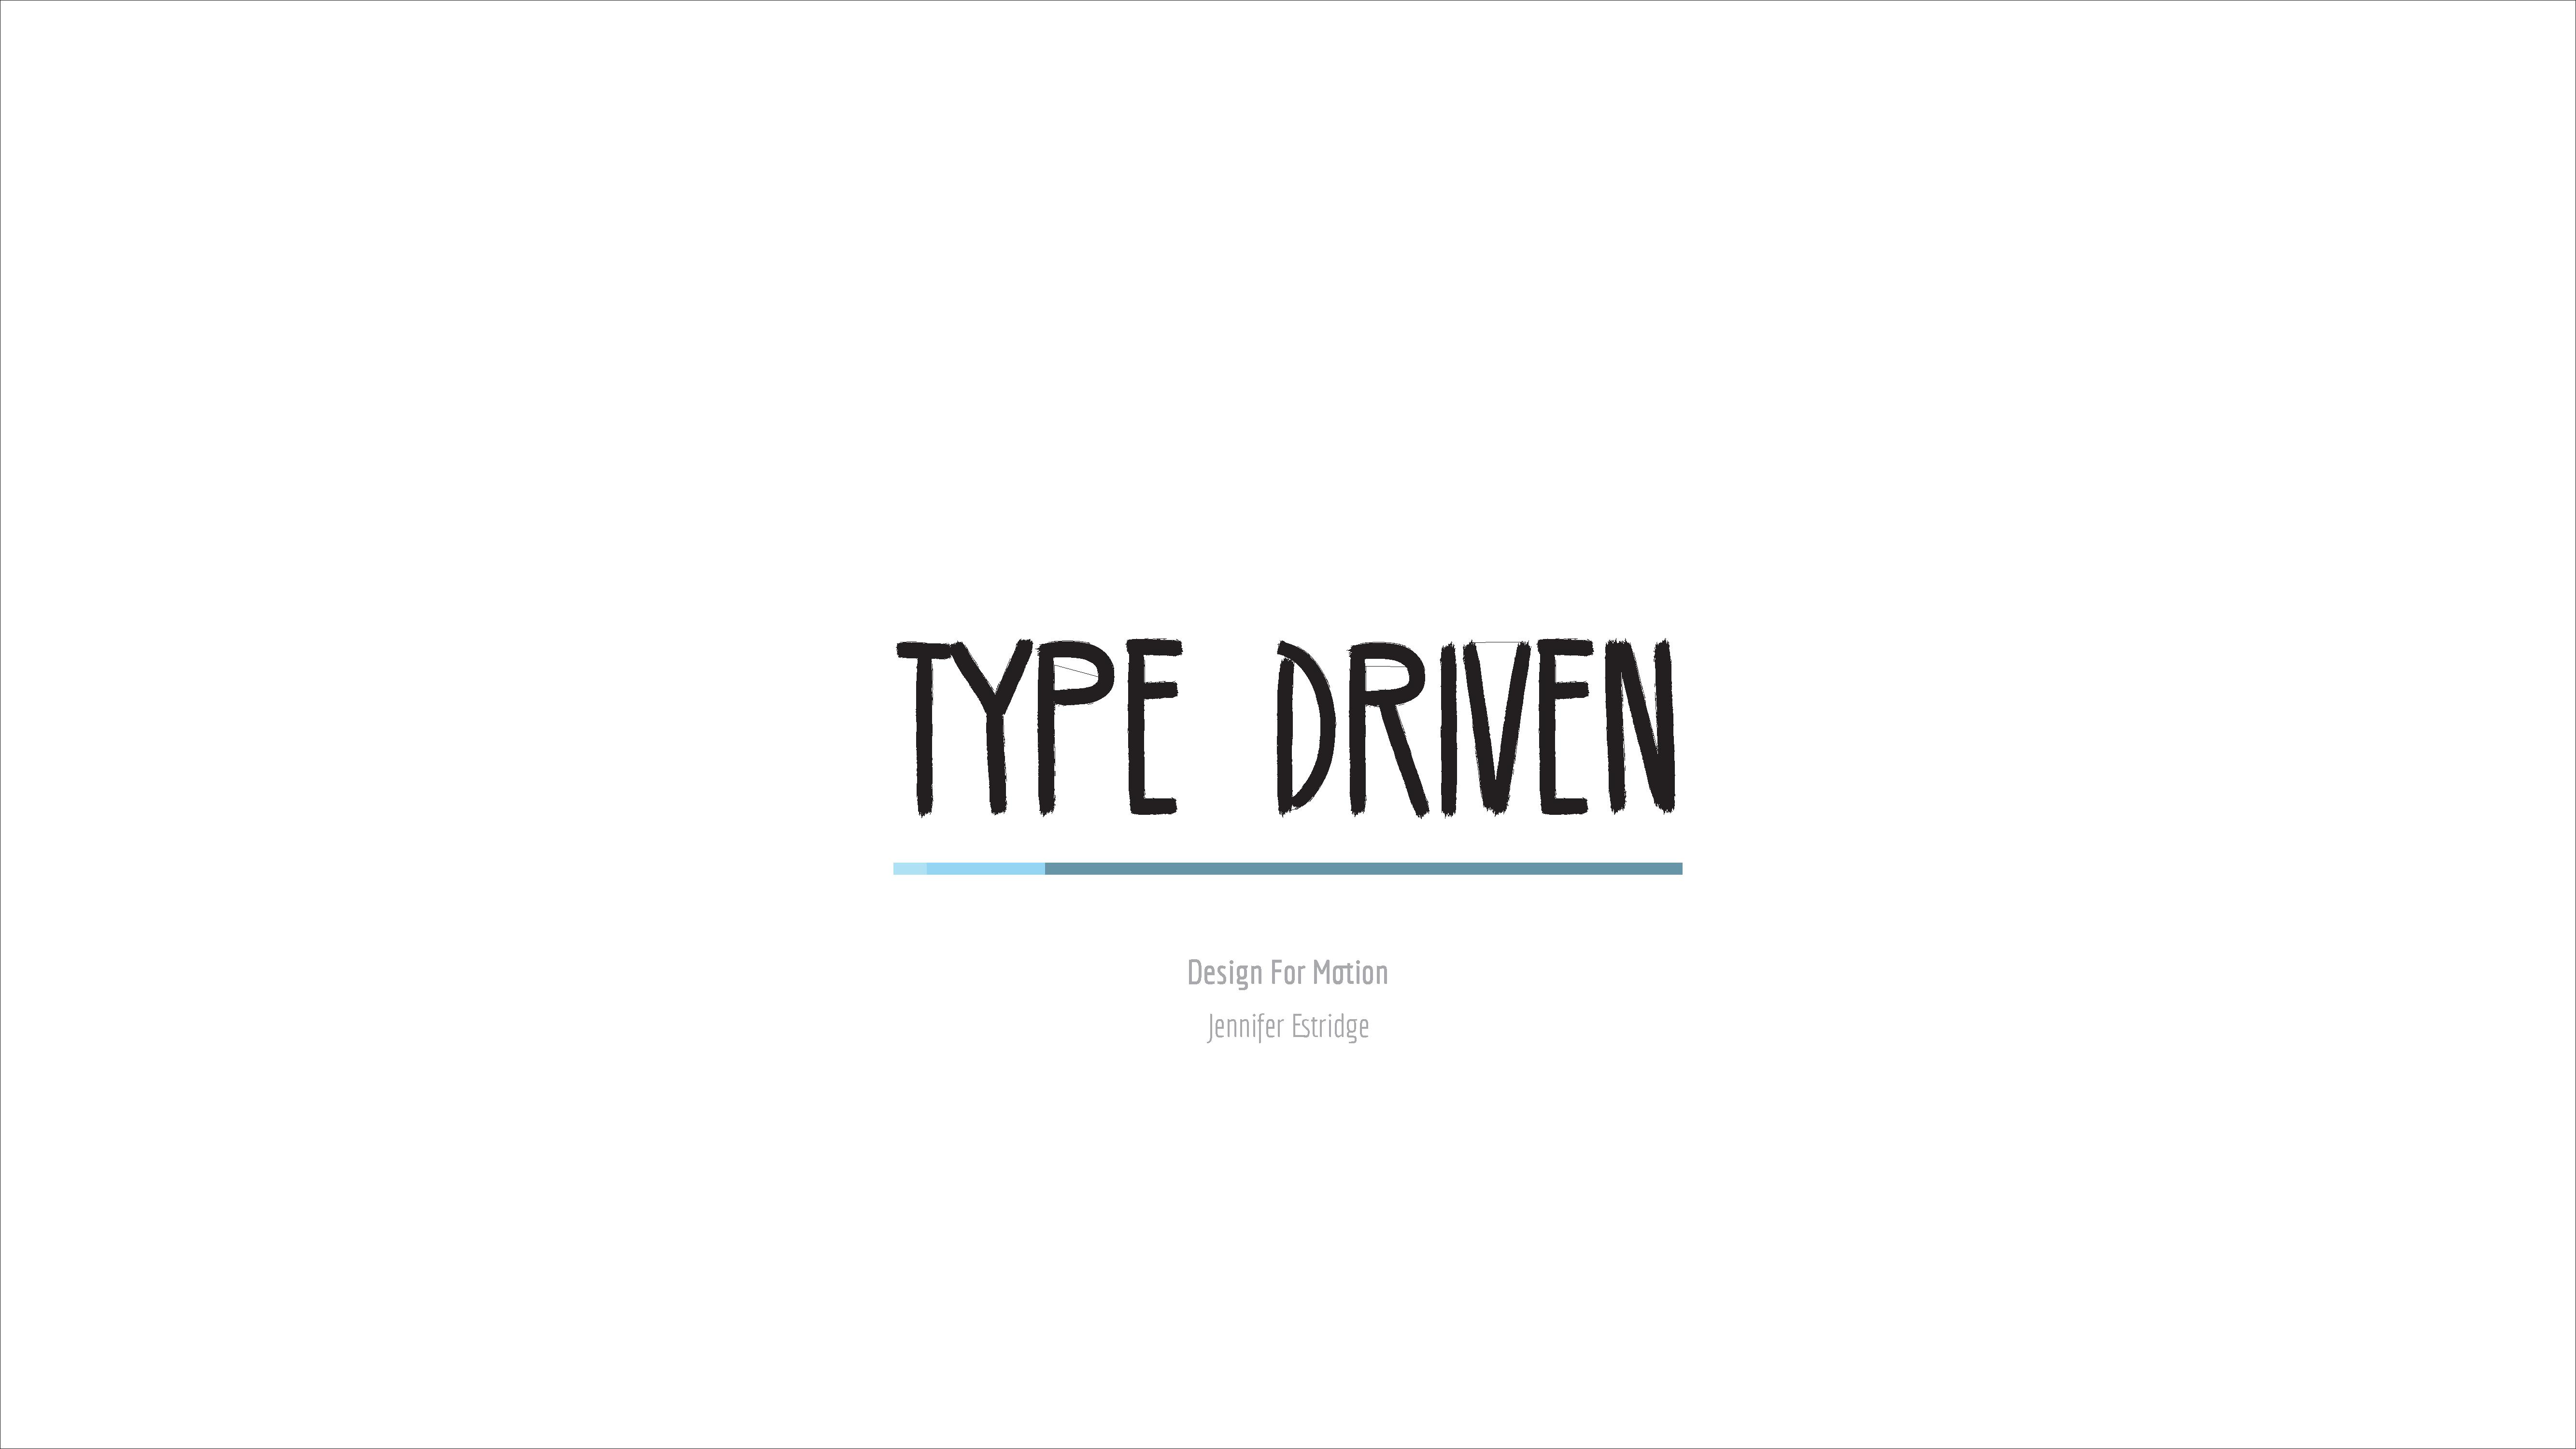 Typedriven_styleframes_jenniferestridge_Page_01